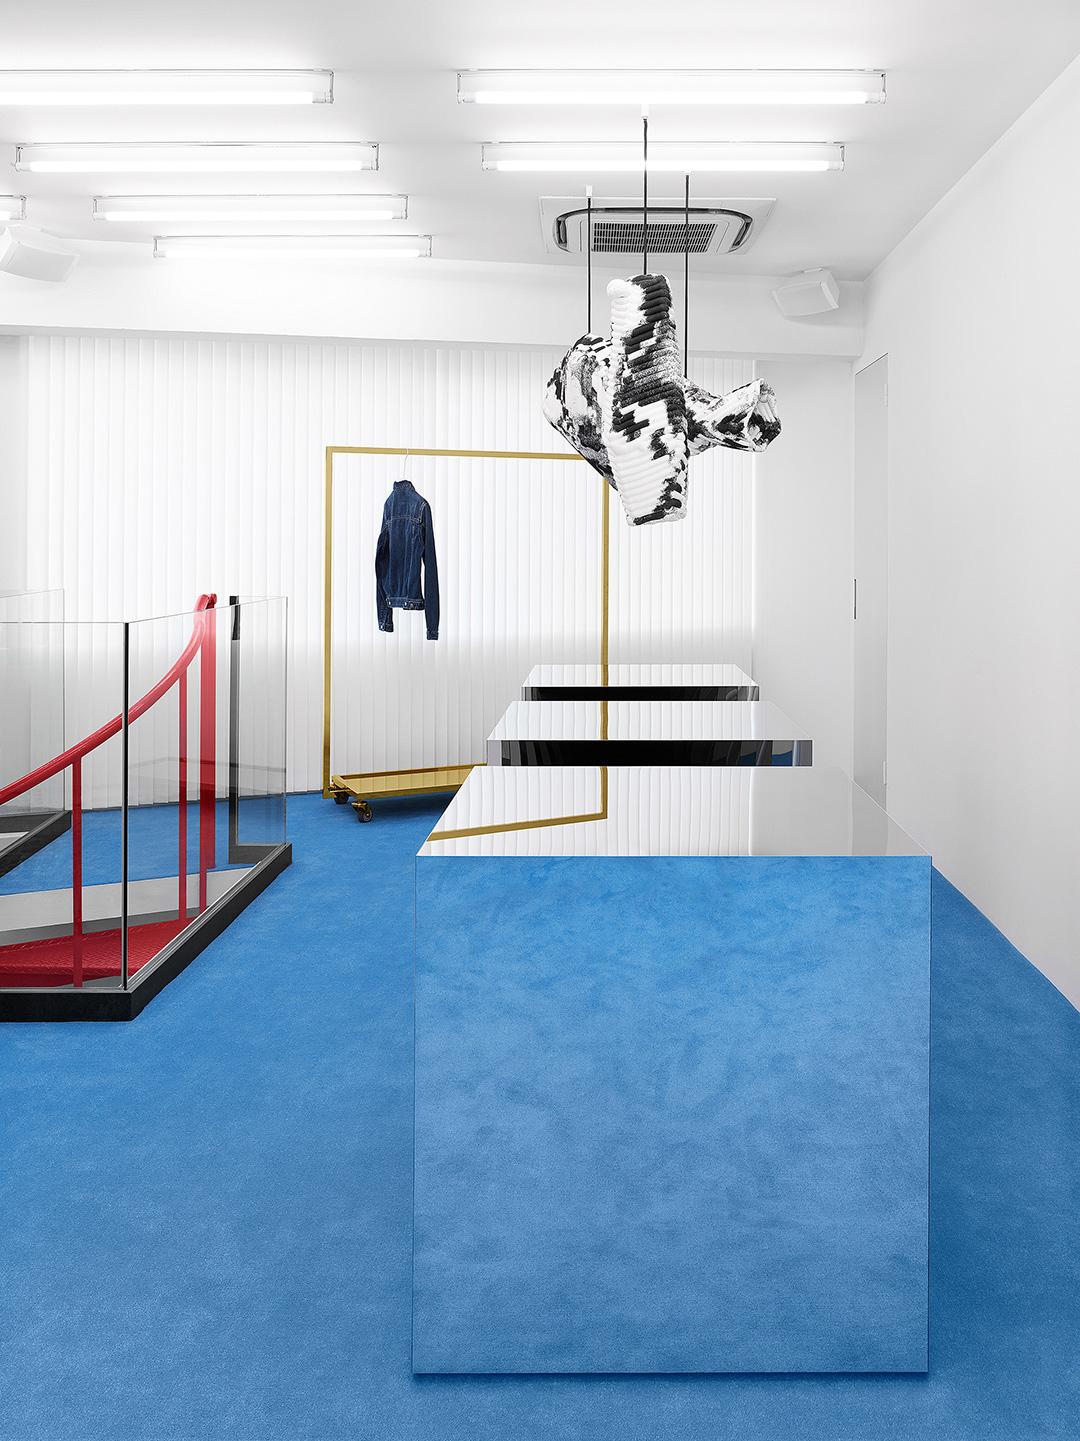 Bla-Konst-Acne-Studios-Denim-Line-and-Retail-Space-Tokyo-Yellowtrace-01.jpg